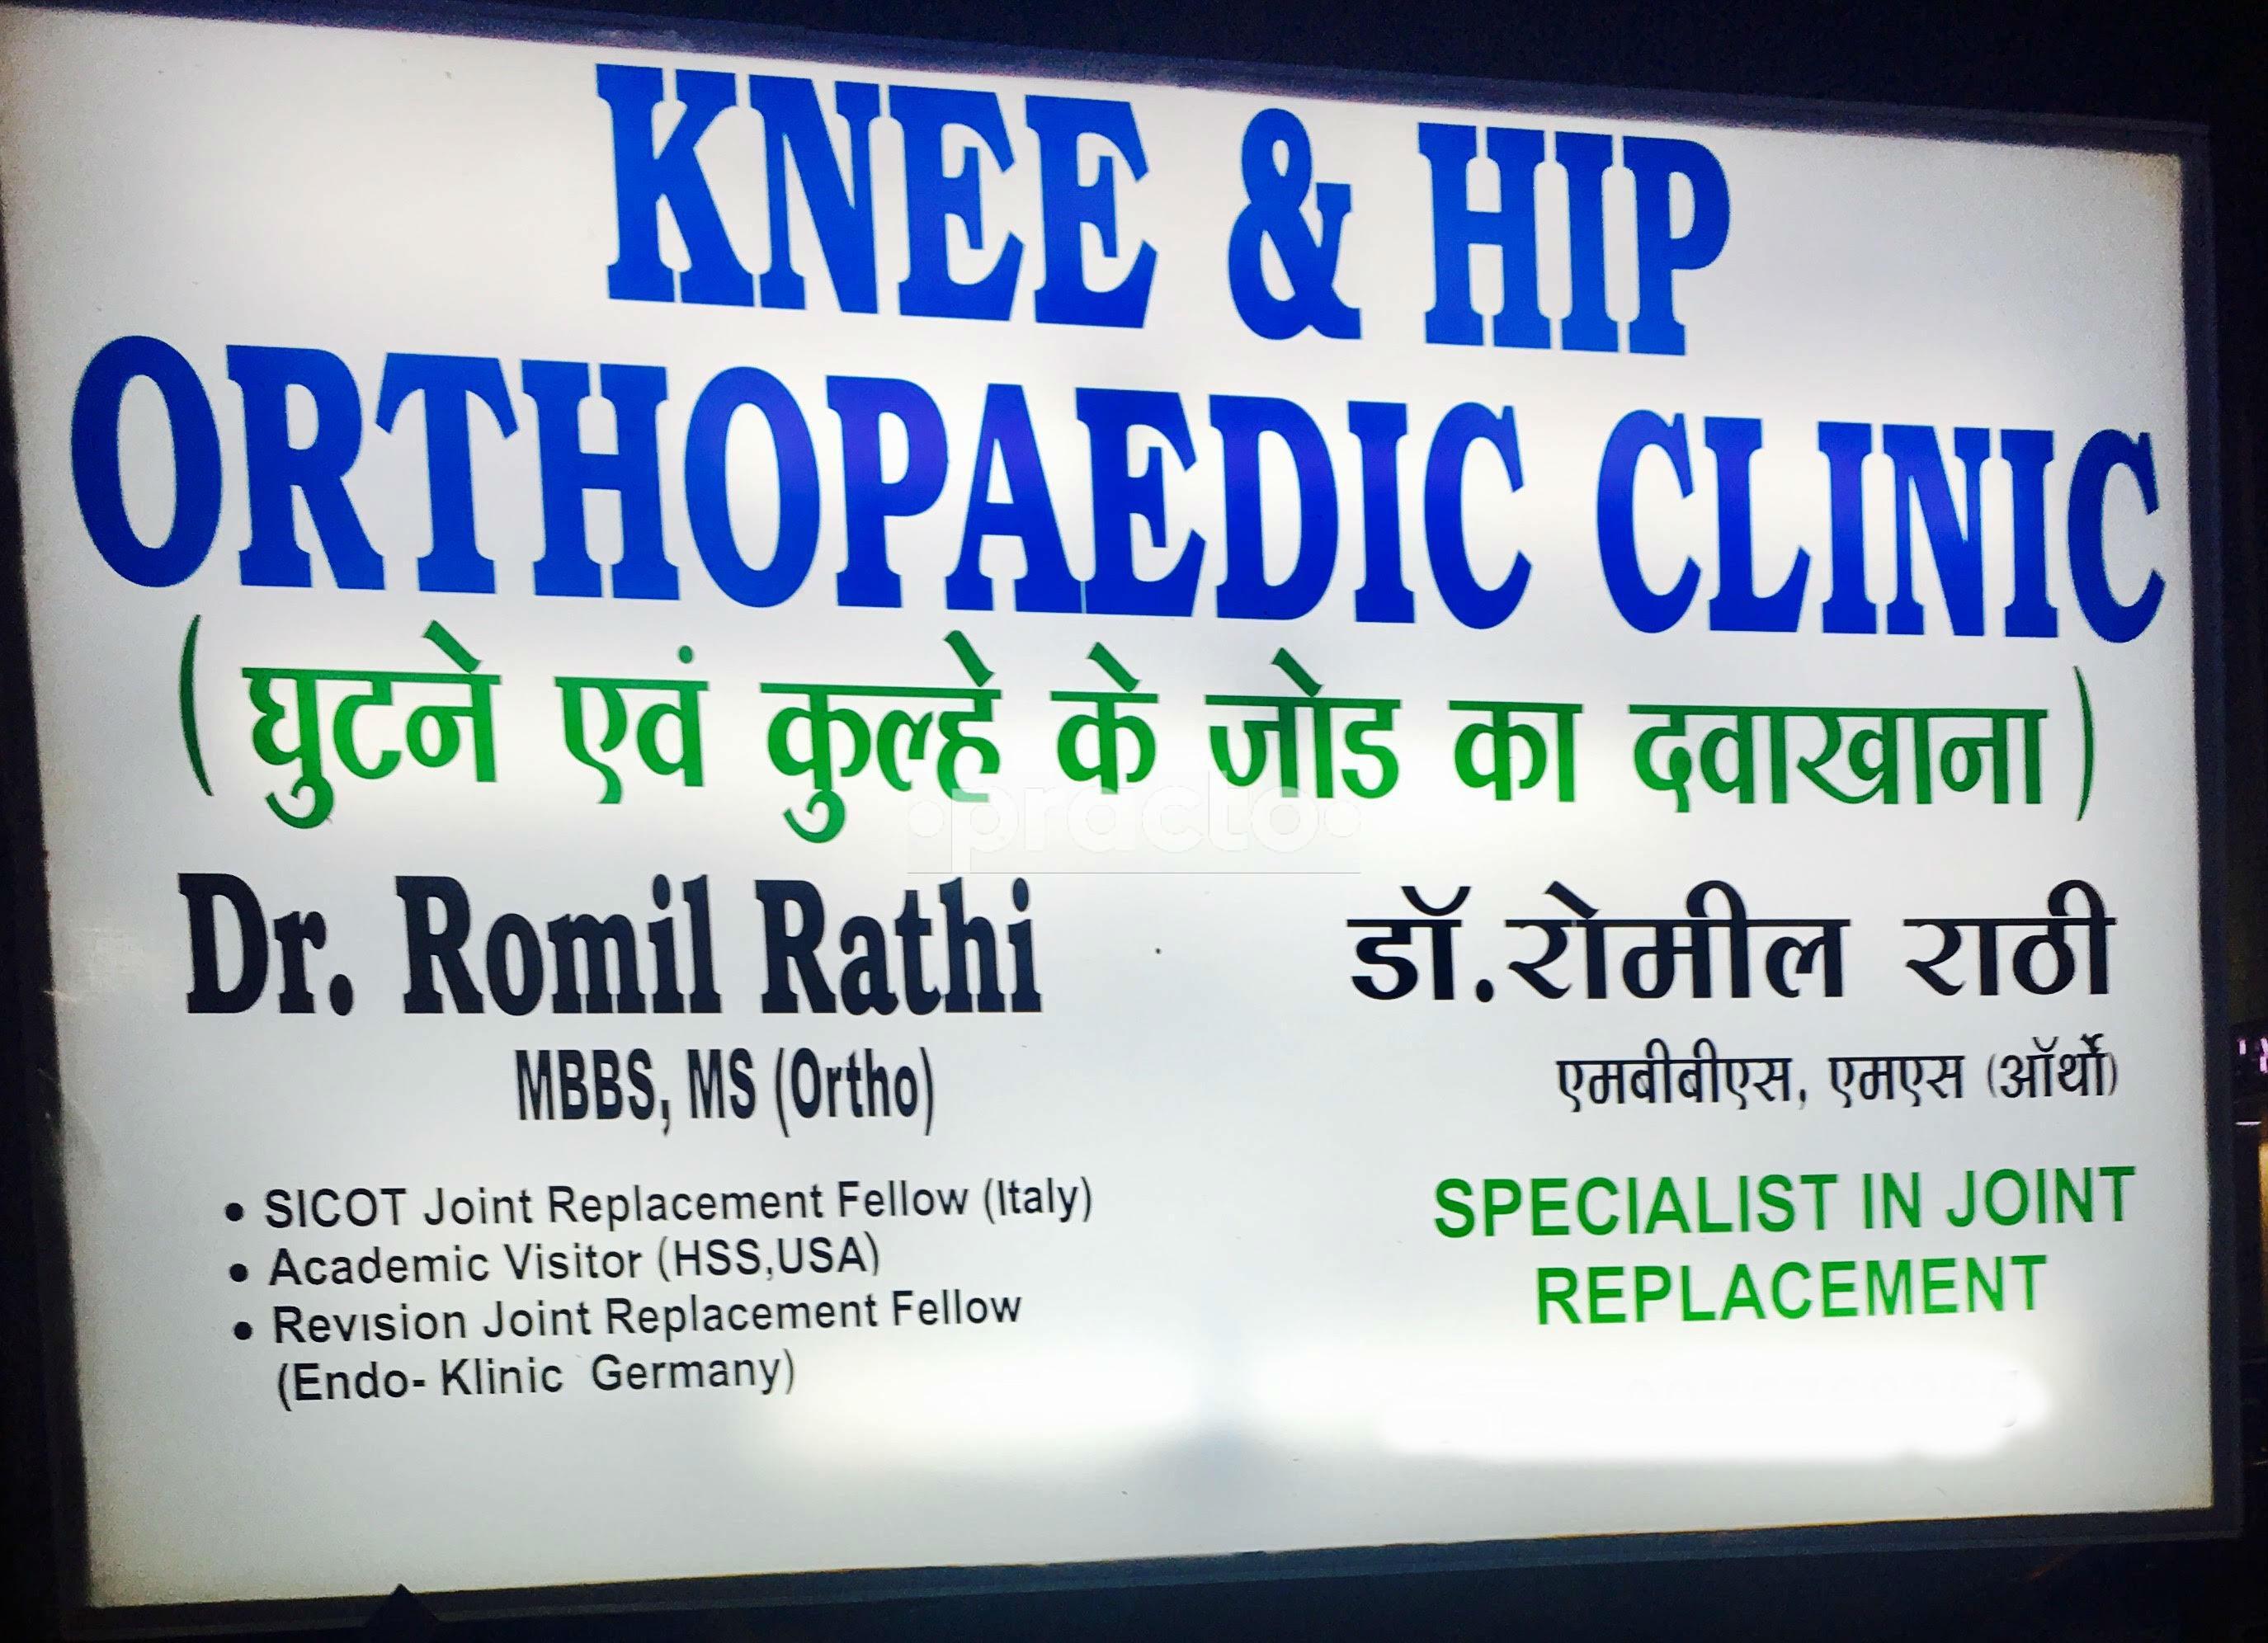 Dr. Romil Rathi's- Knee & Hip Orthopaedic Clinic, Nagpur